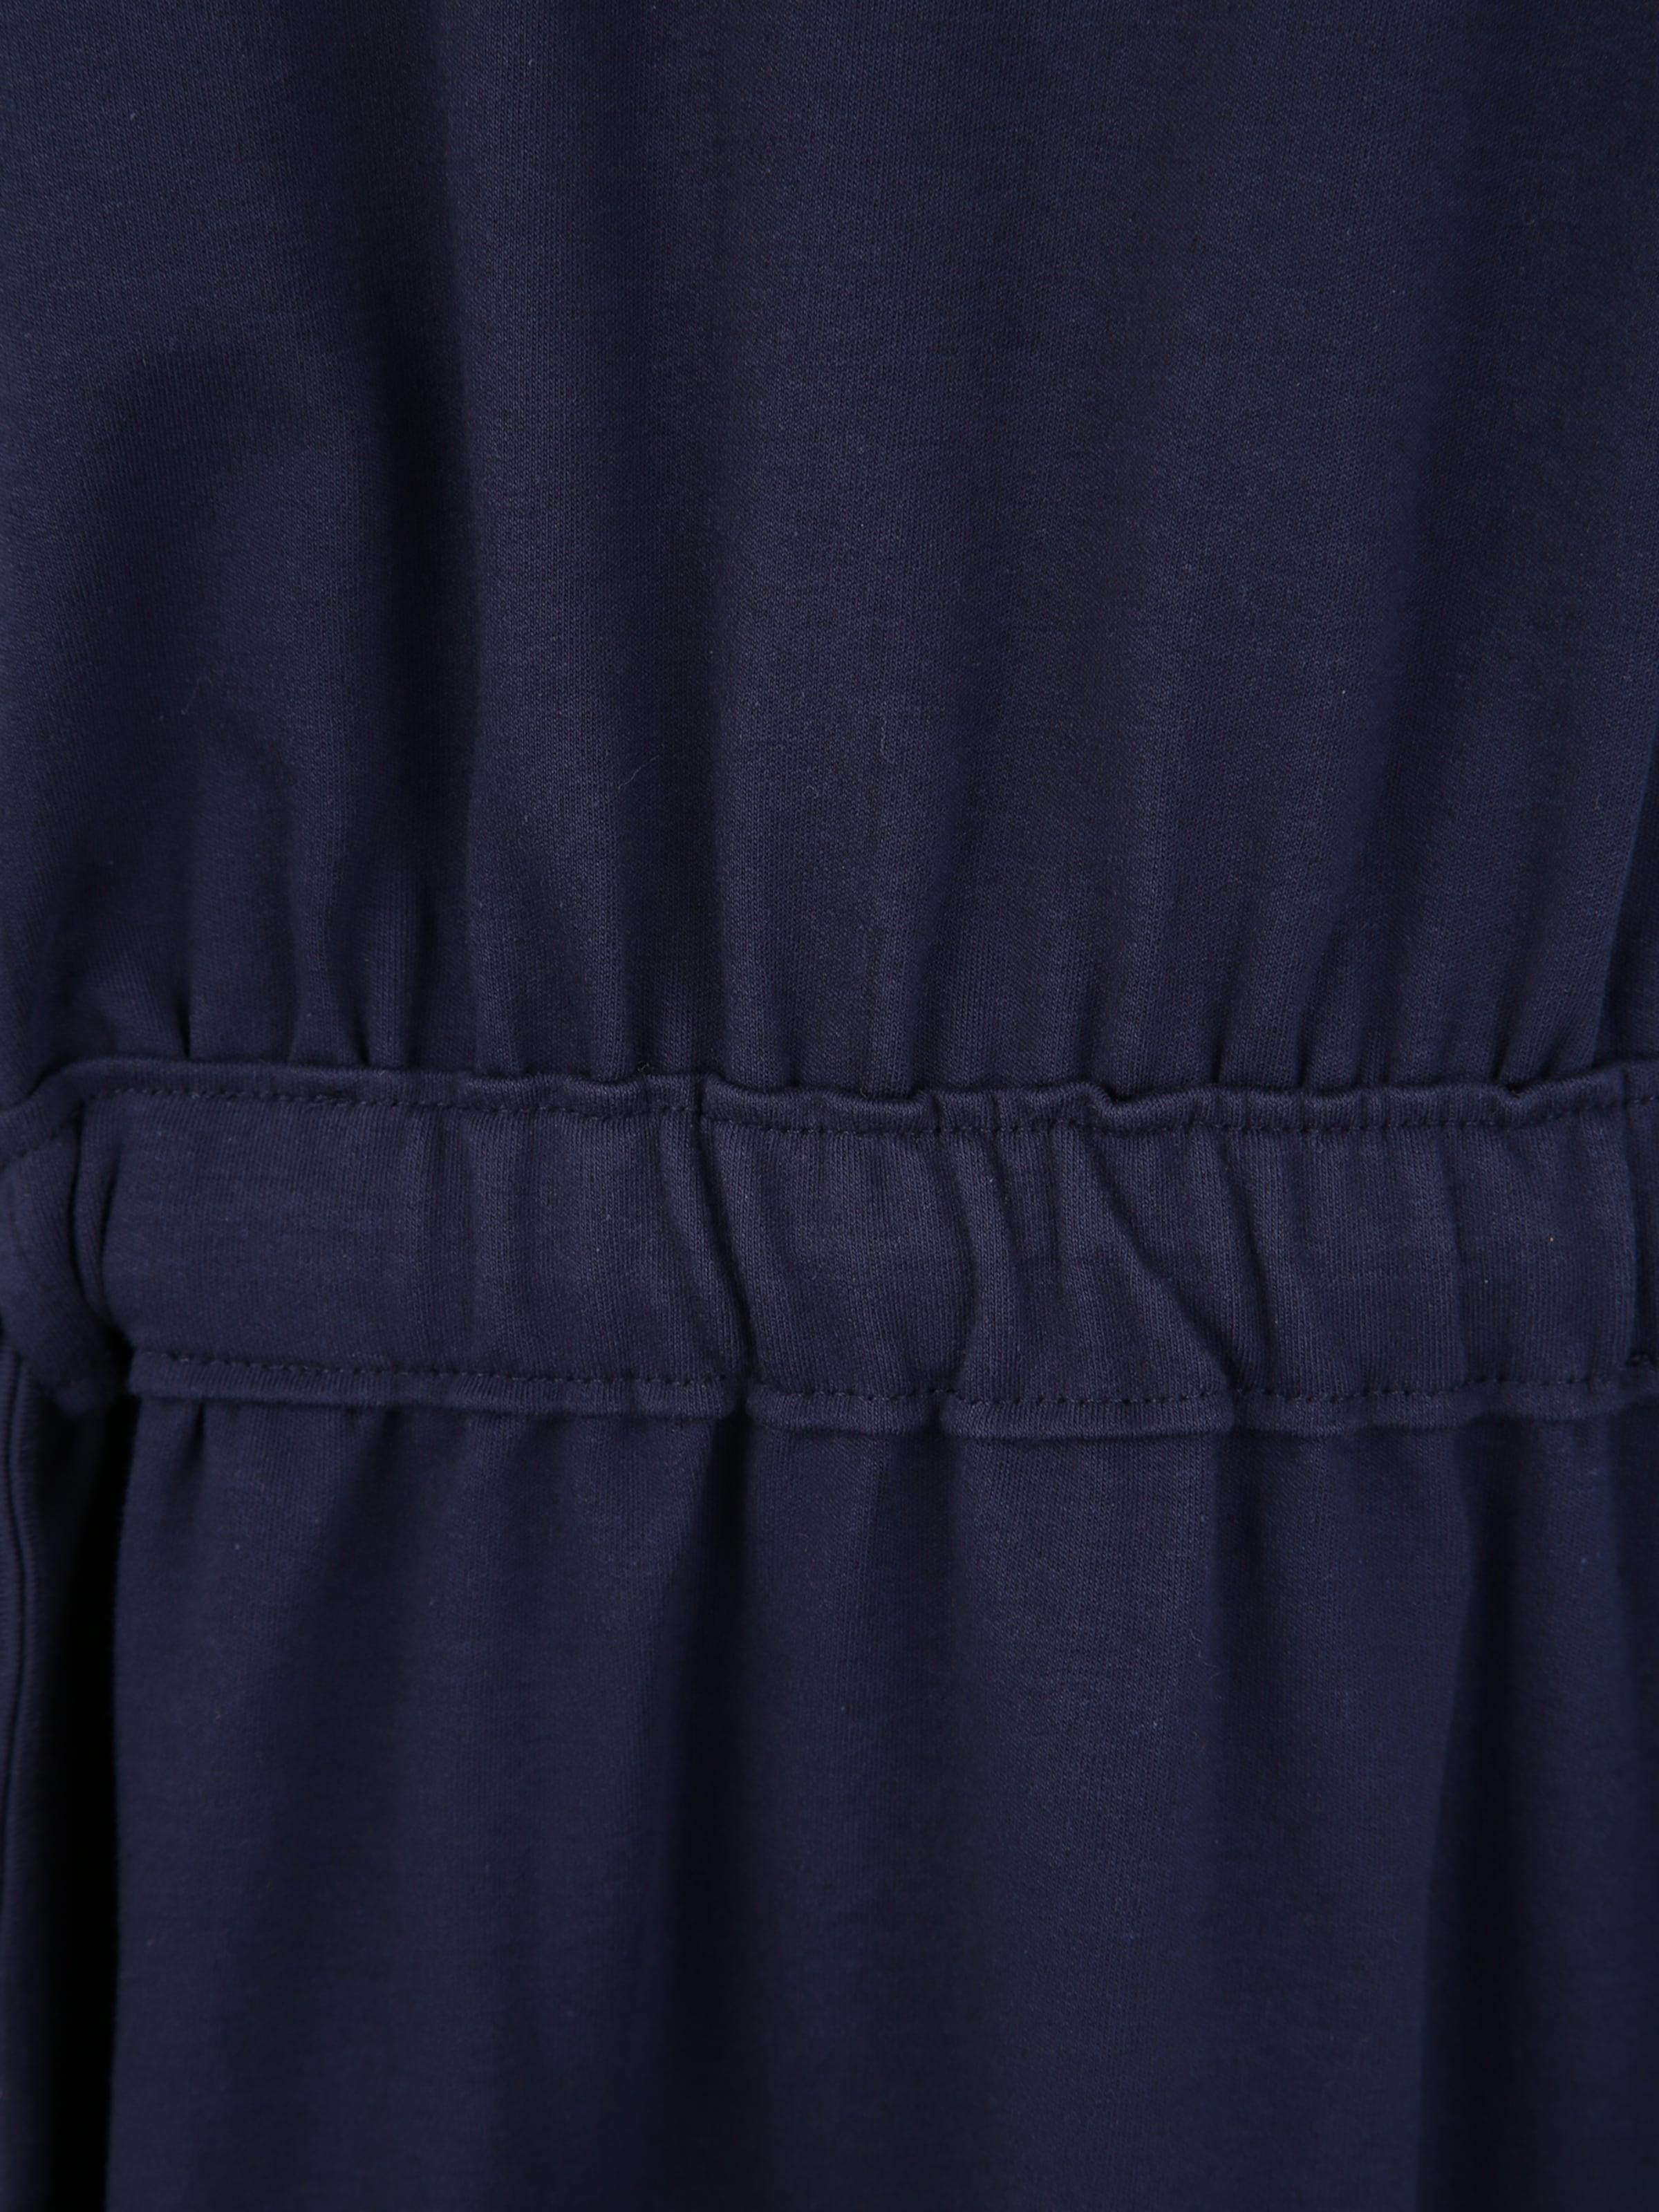 WomenRobe Tom Foncé Tailor En Bleu NwPnX8O0k